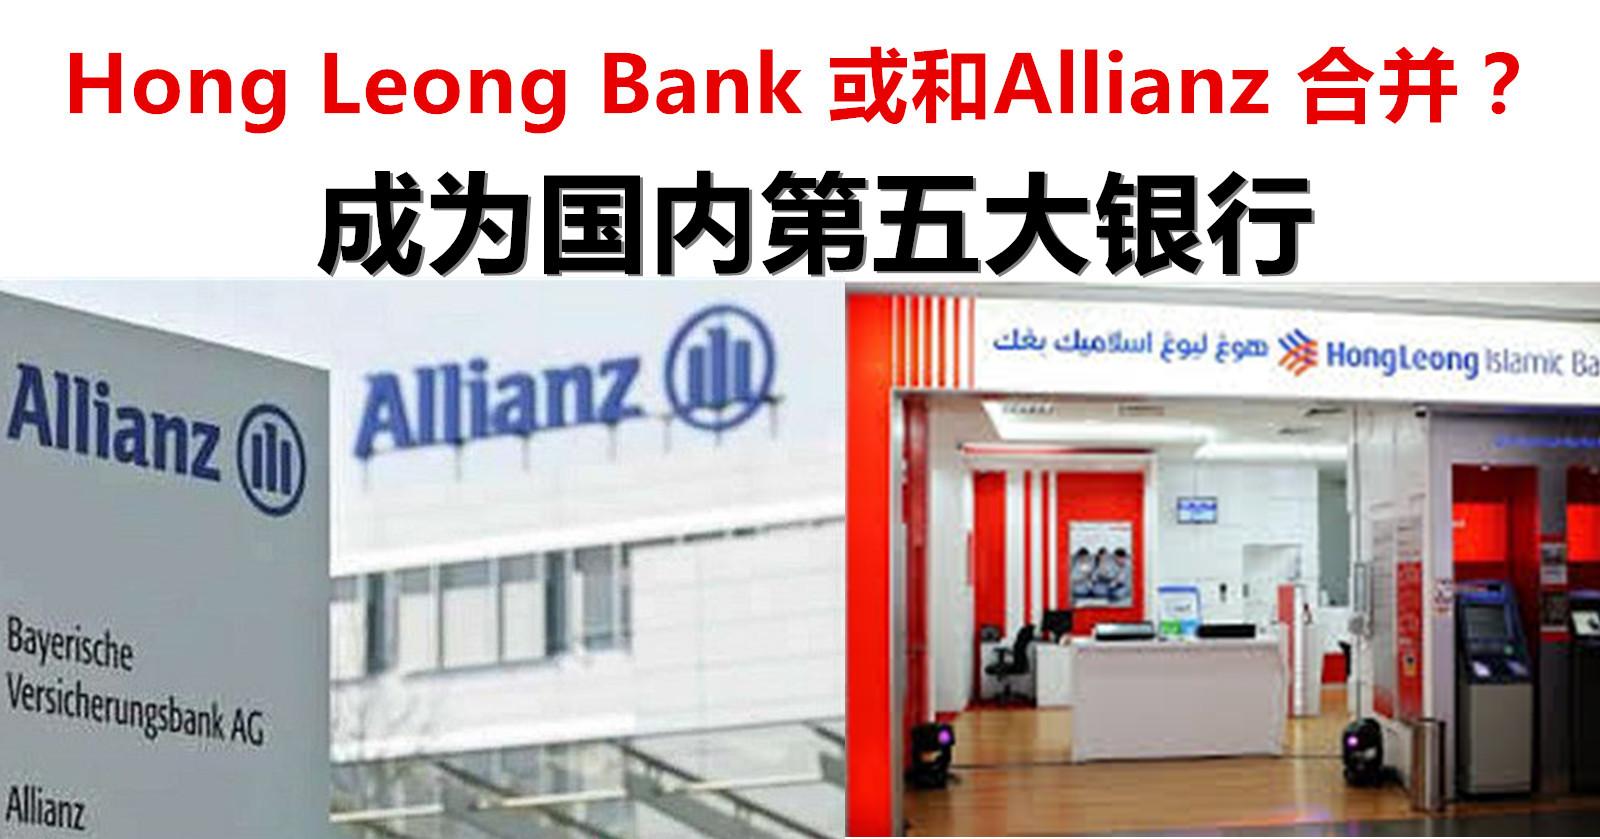 Hong Leong Bank 或和Allianz 合并? | LC 小傢伙綜合網